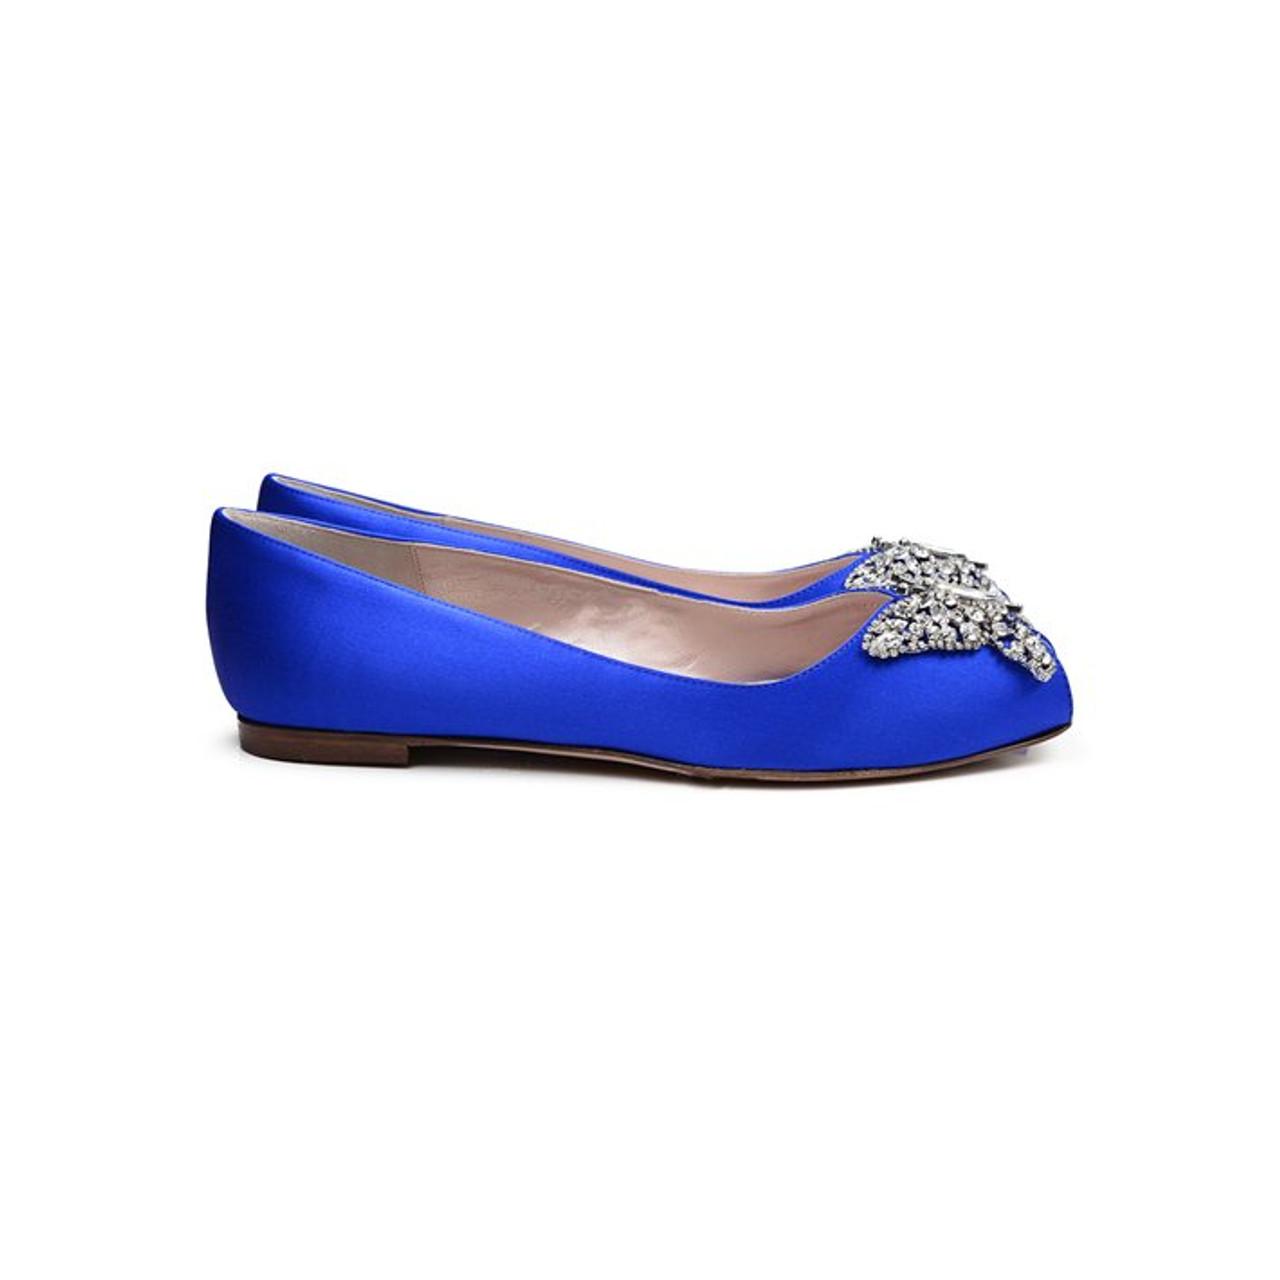 Liana Cobalt Blue Satin